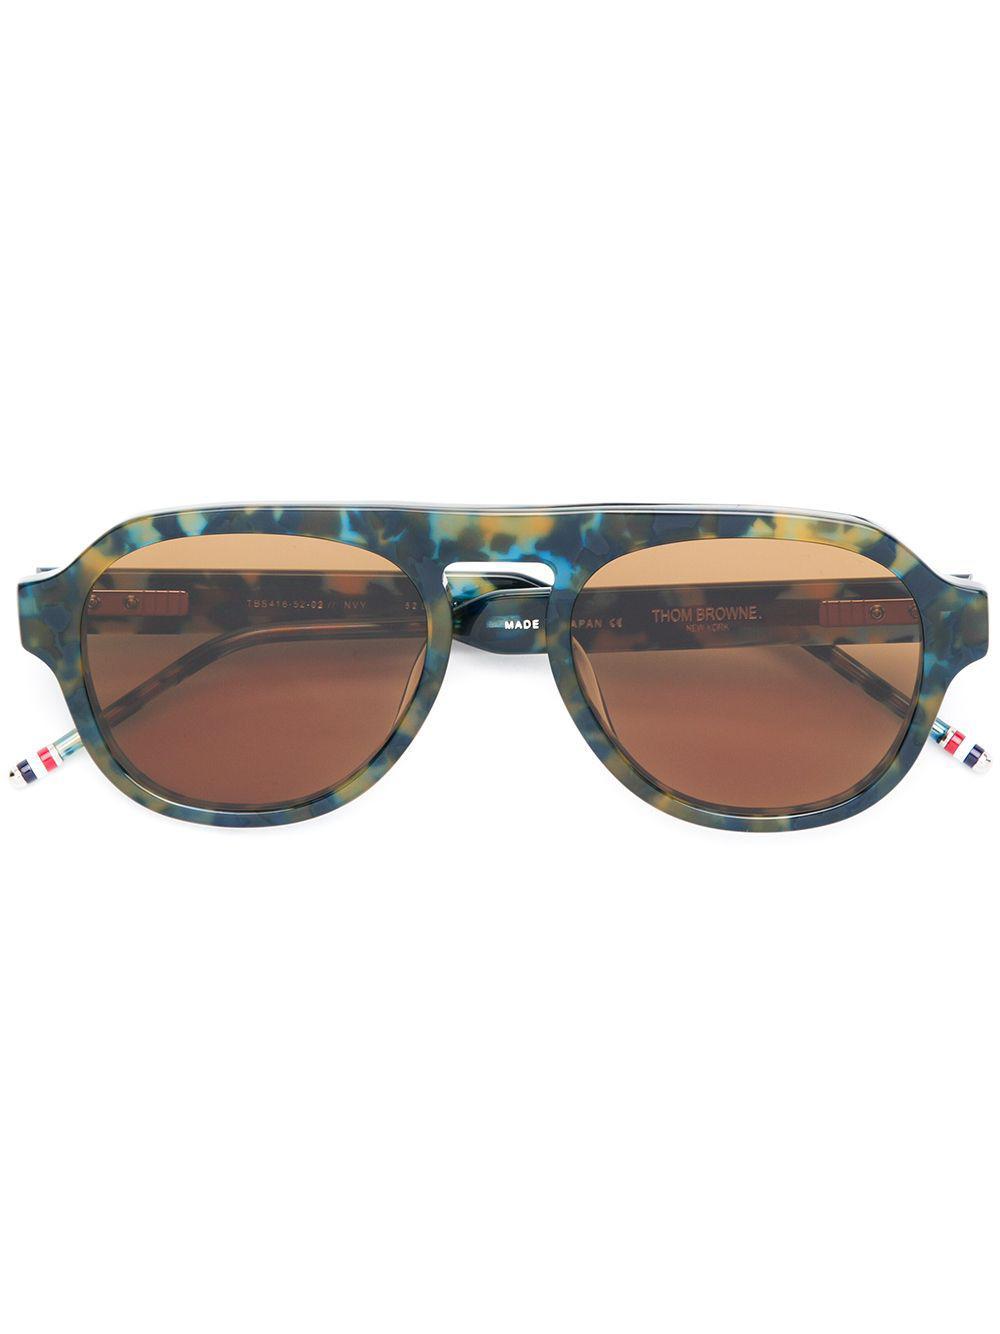 2bd331f10cf7 Thom Browne - Blue Round-frame Glasses for Men - Lyst. View fullscreen